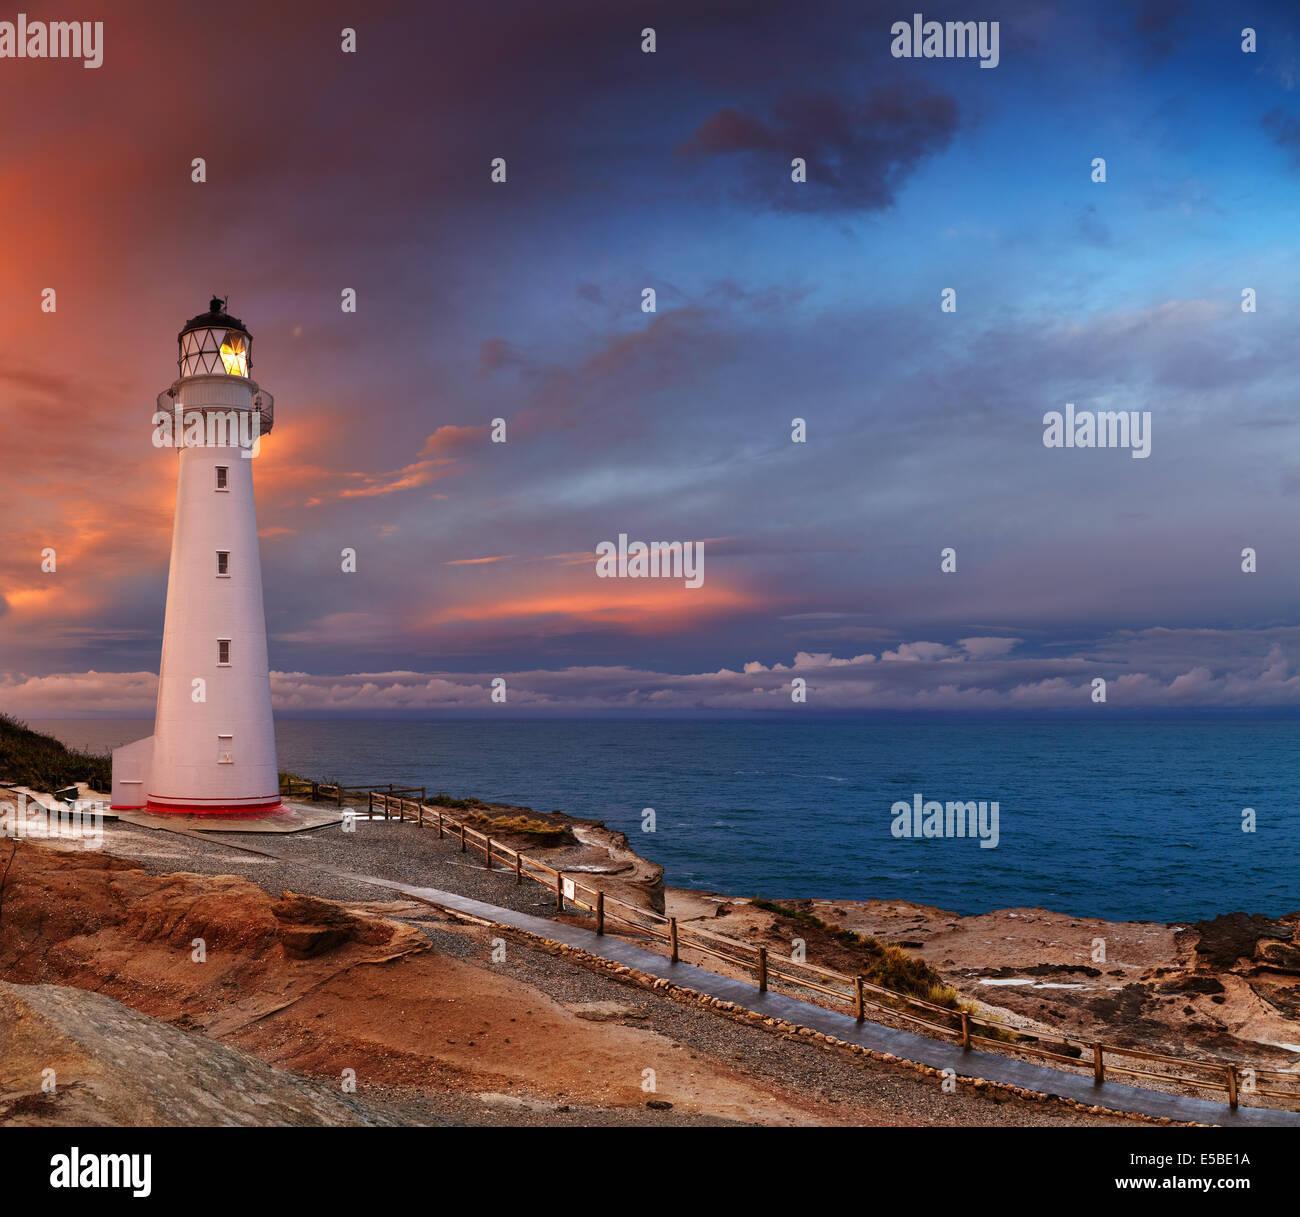 Castle Point Lighthouse, tramonto, Wairarapa, Nuova Zelanda Immagini Stock